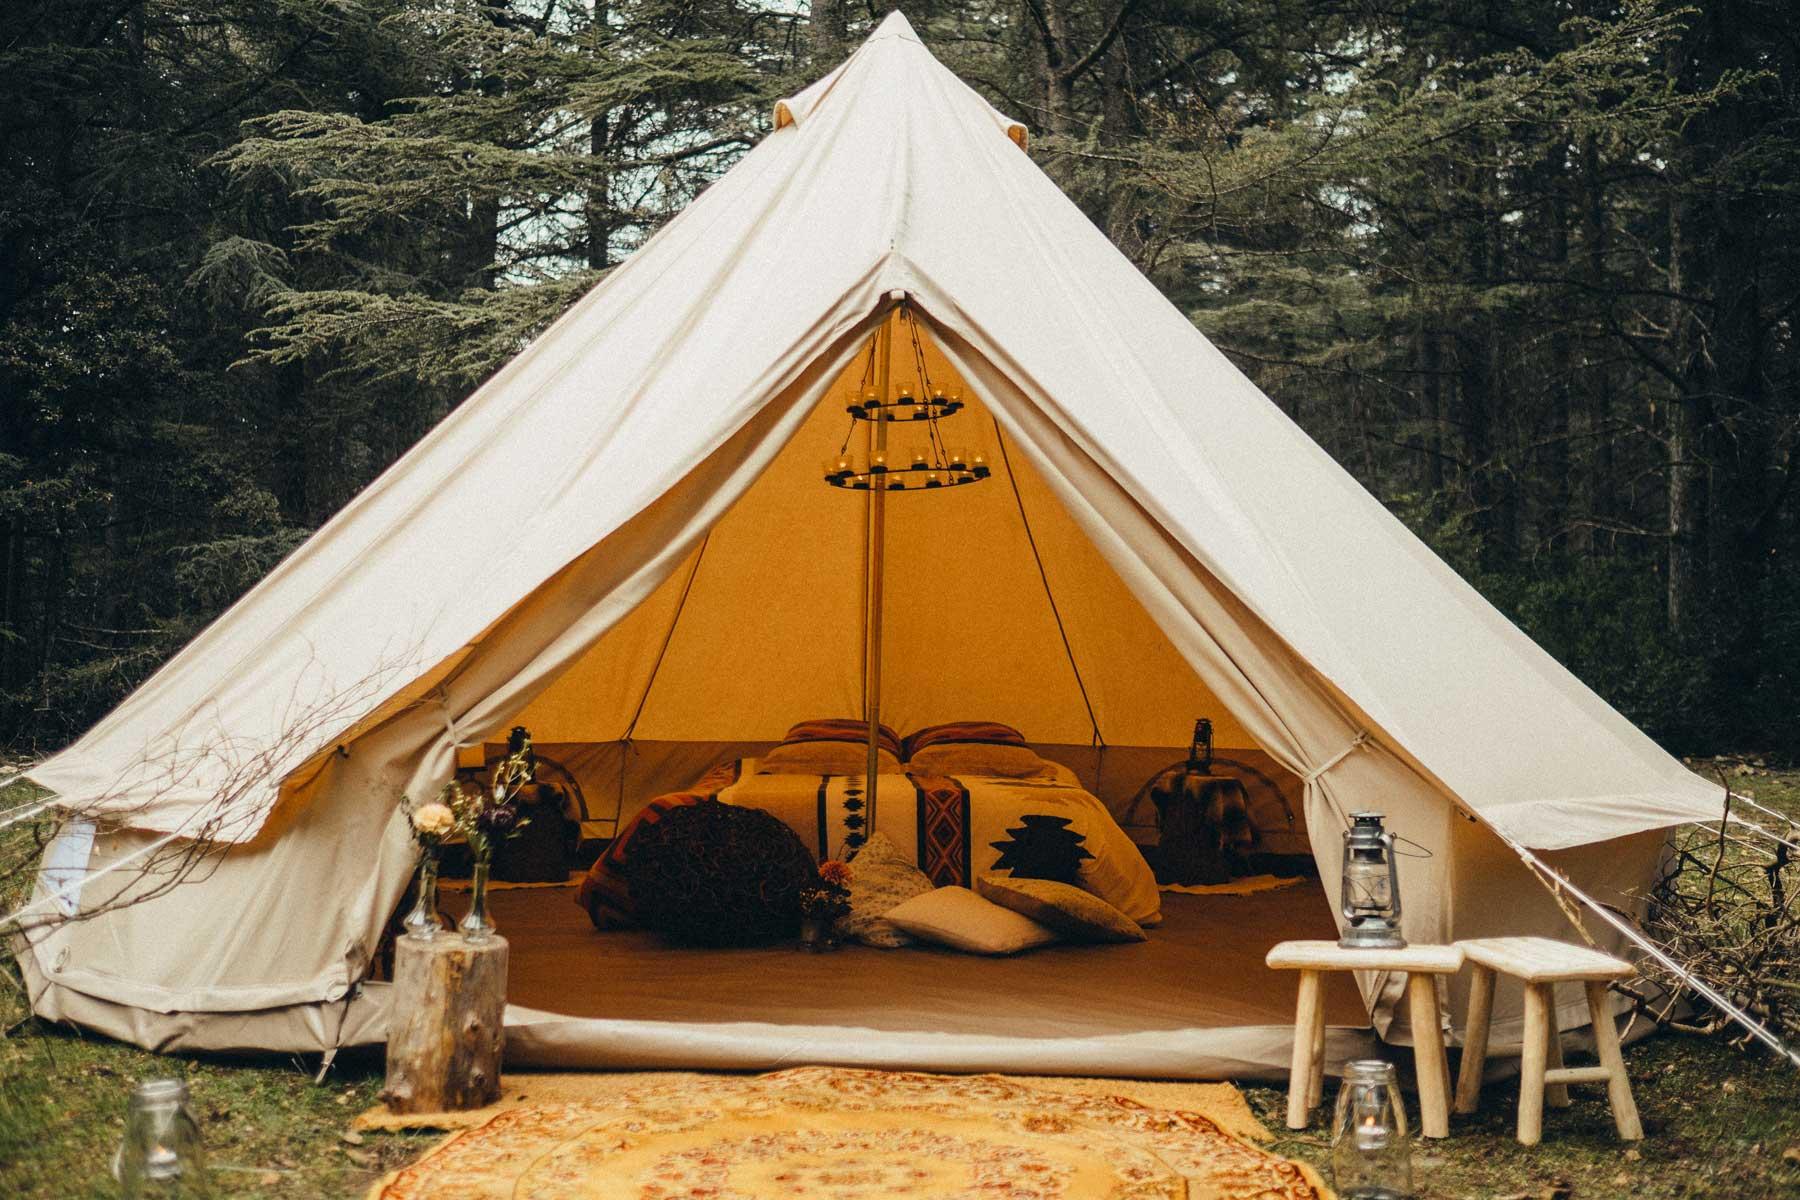 location tente mariage wild mon wedding camping. Black Bedroom Furniture Sets. Home Design Ideas